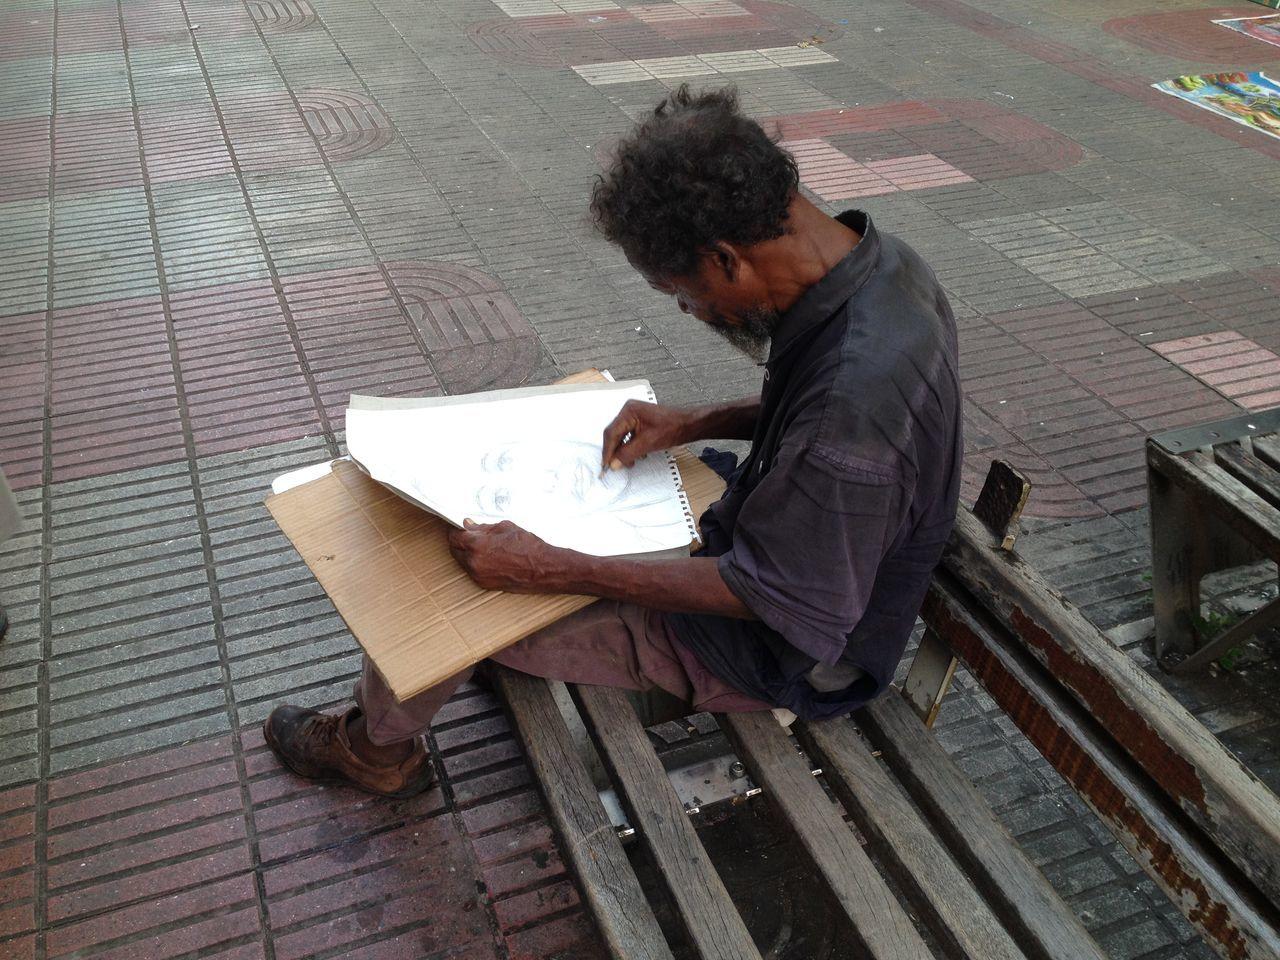 Beautiful stock photos of zeichnungen, one person, reading, leisure activity, lifestyles